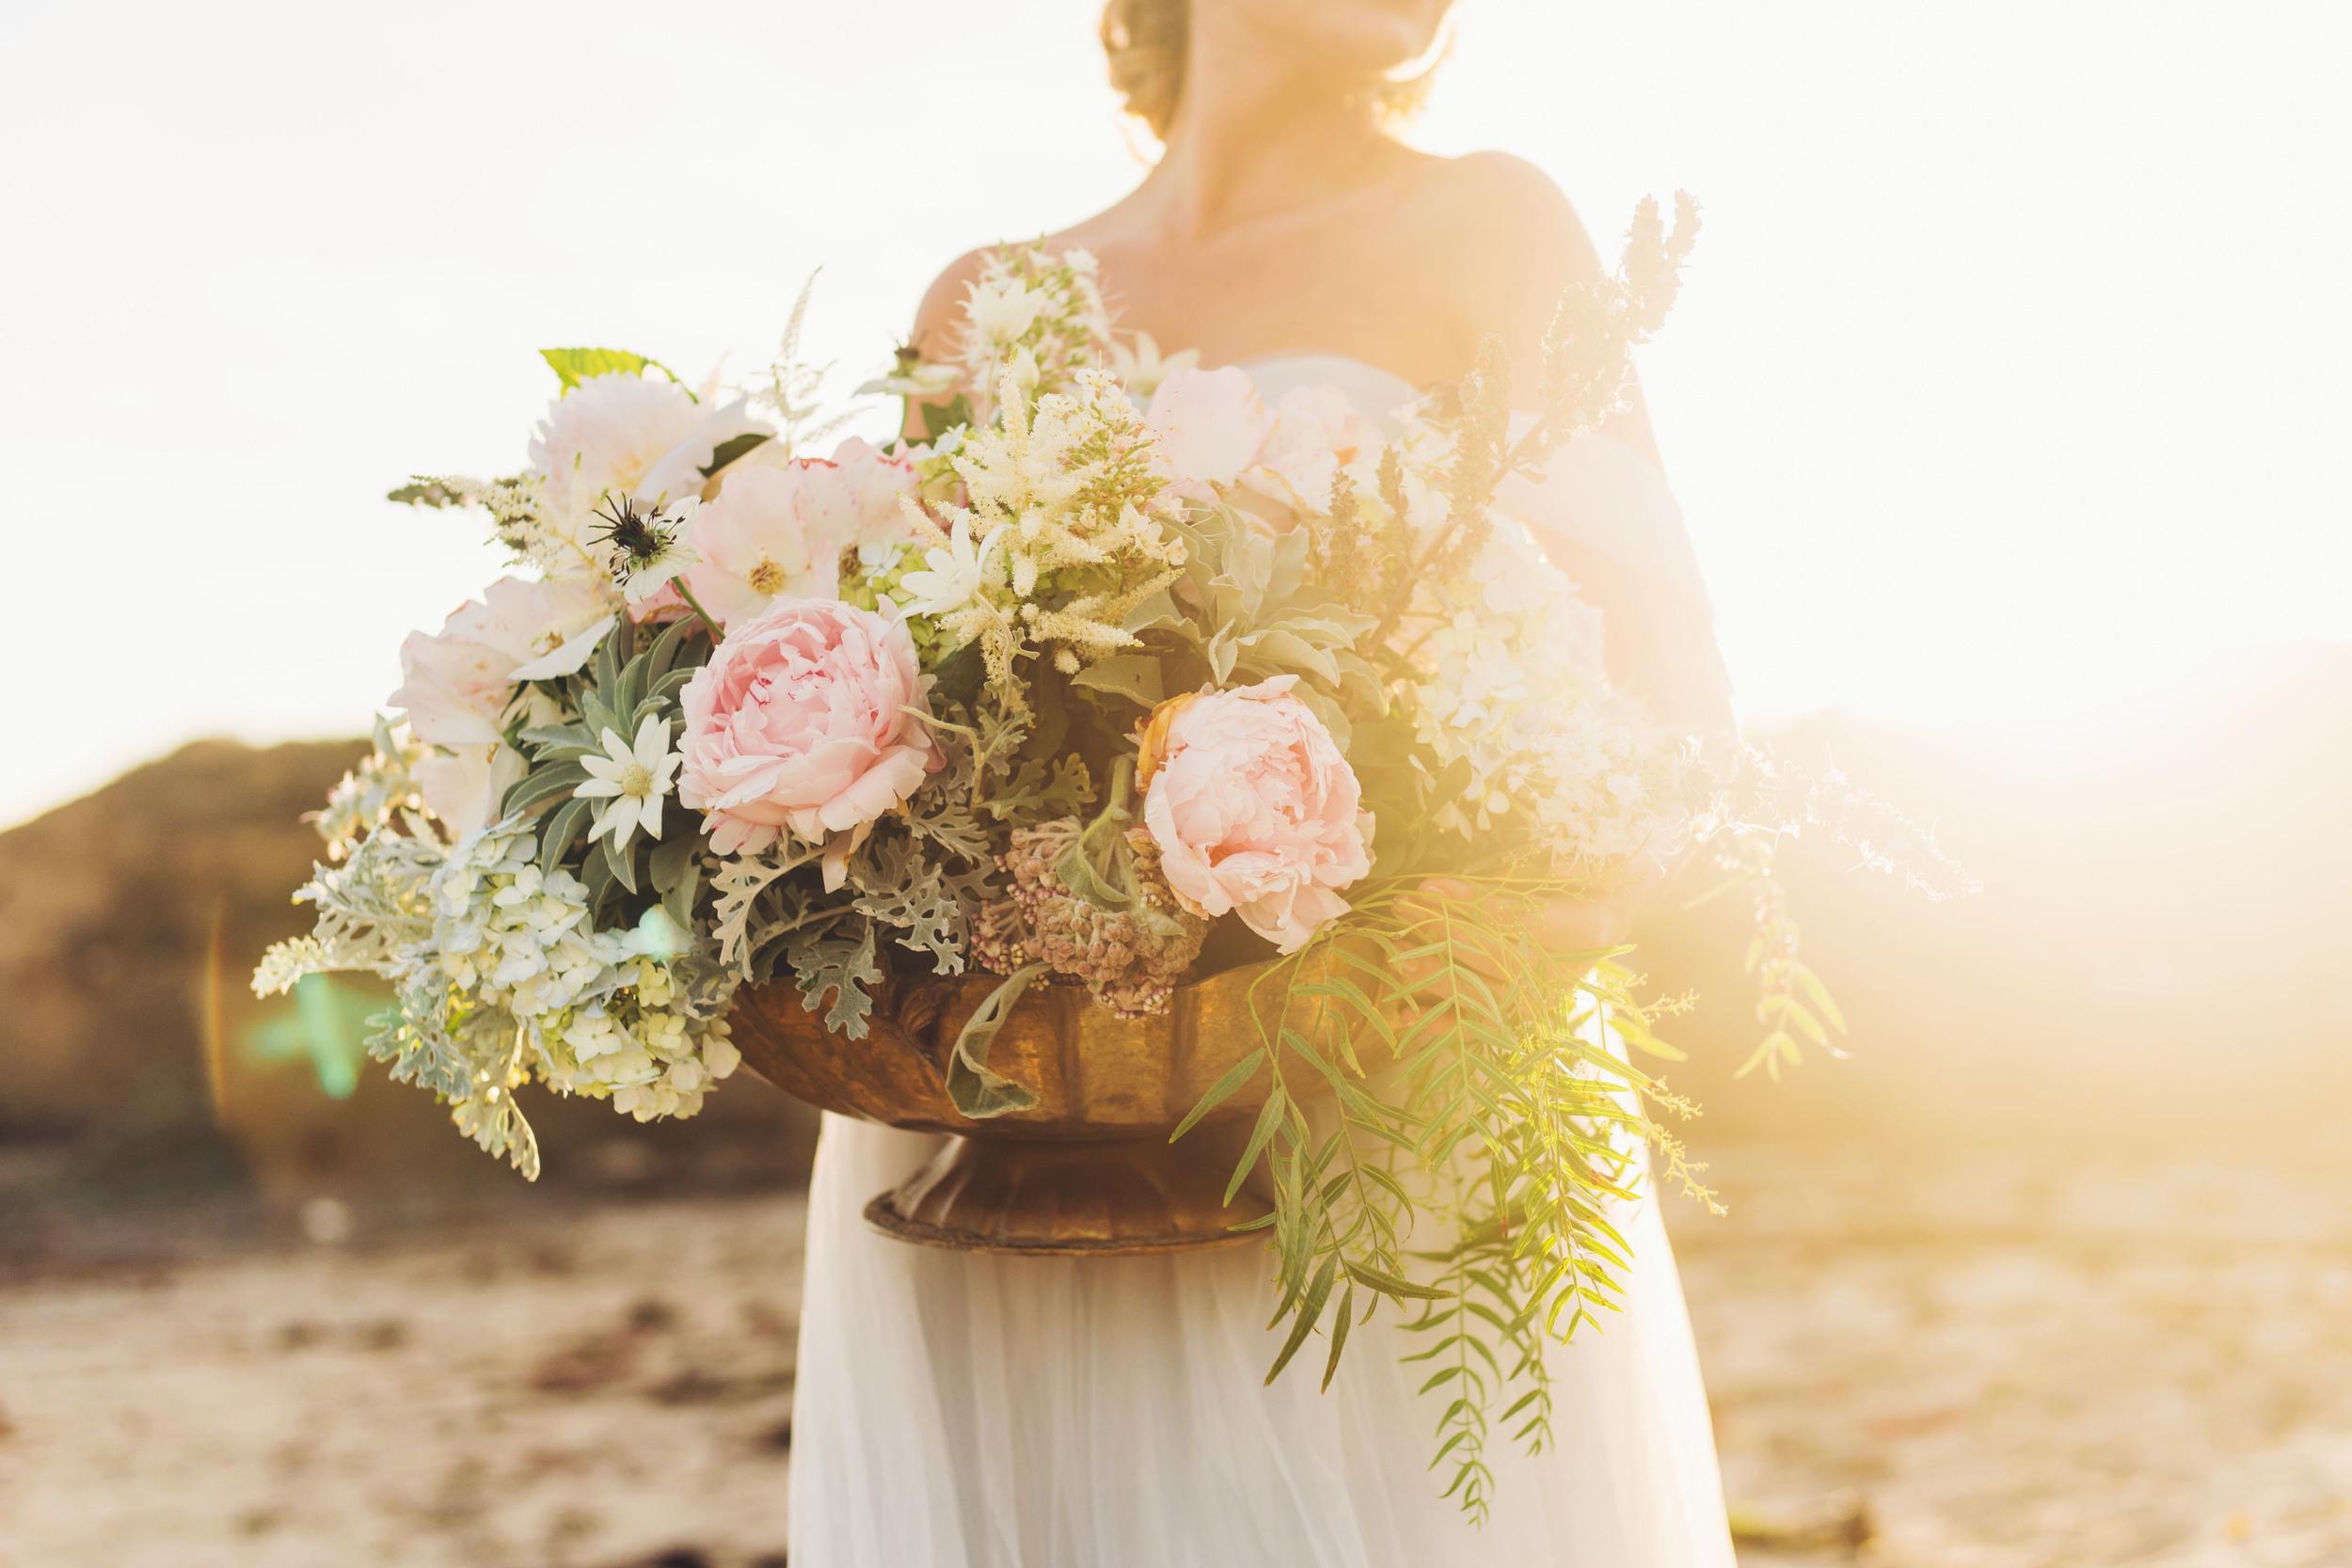 Flower arrangment with Peonies, Hydrangeas, Jasmine